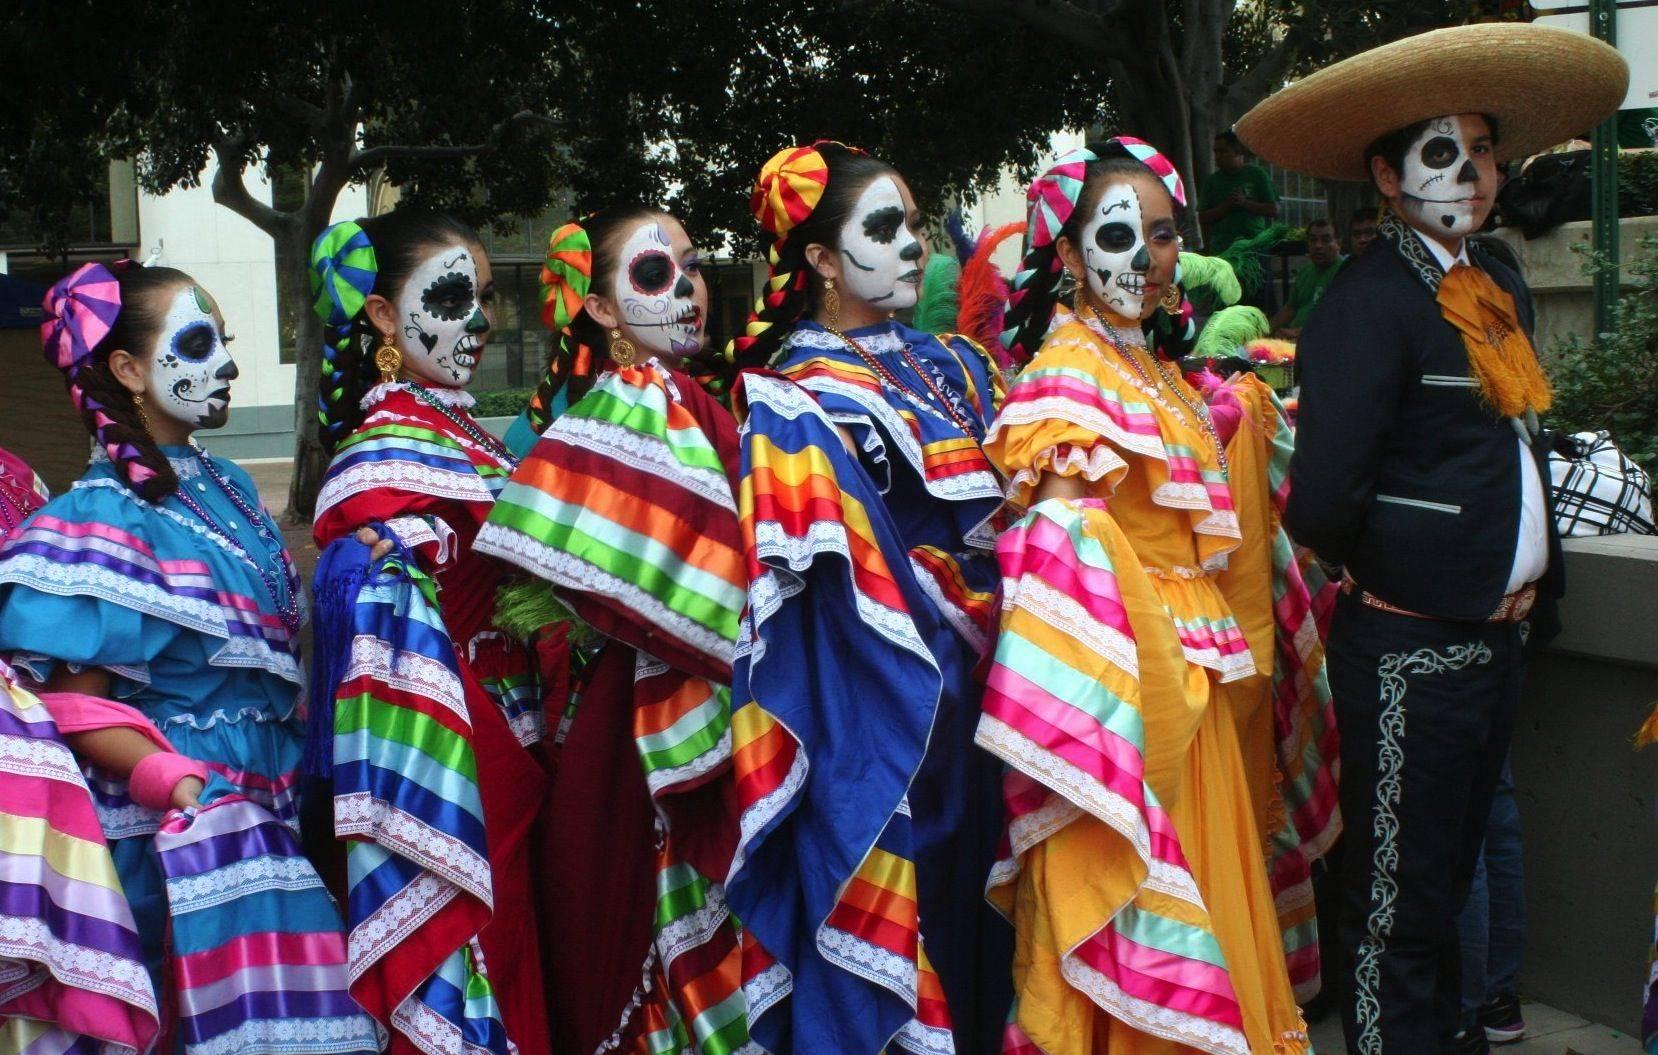 Как провести хэллоуин в школе - идеи для хэллоуина